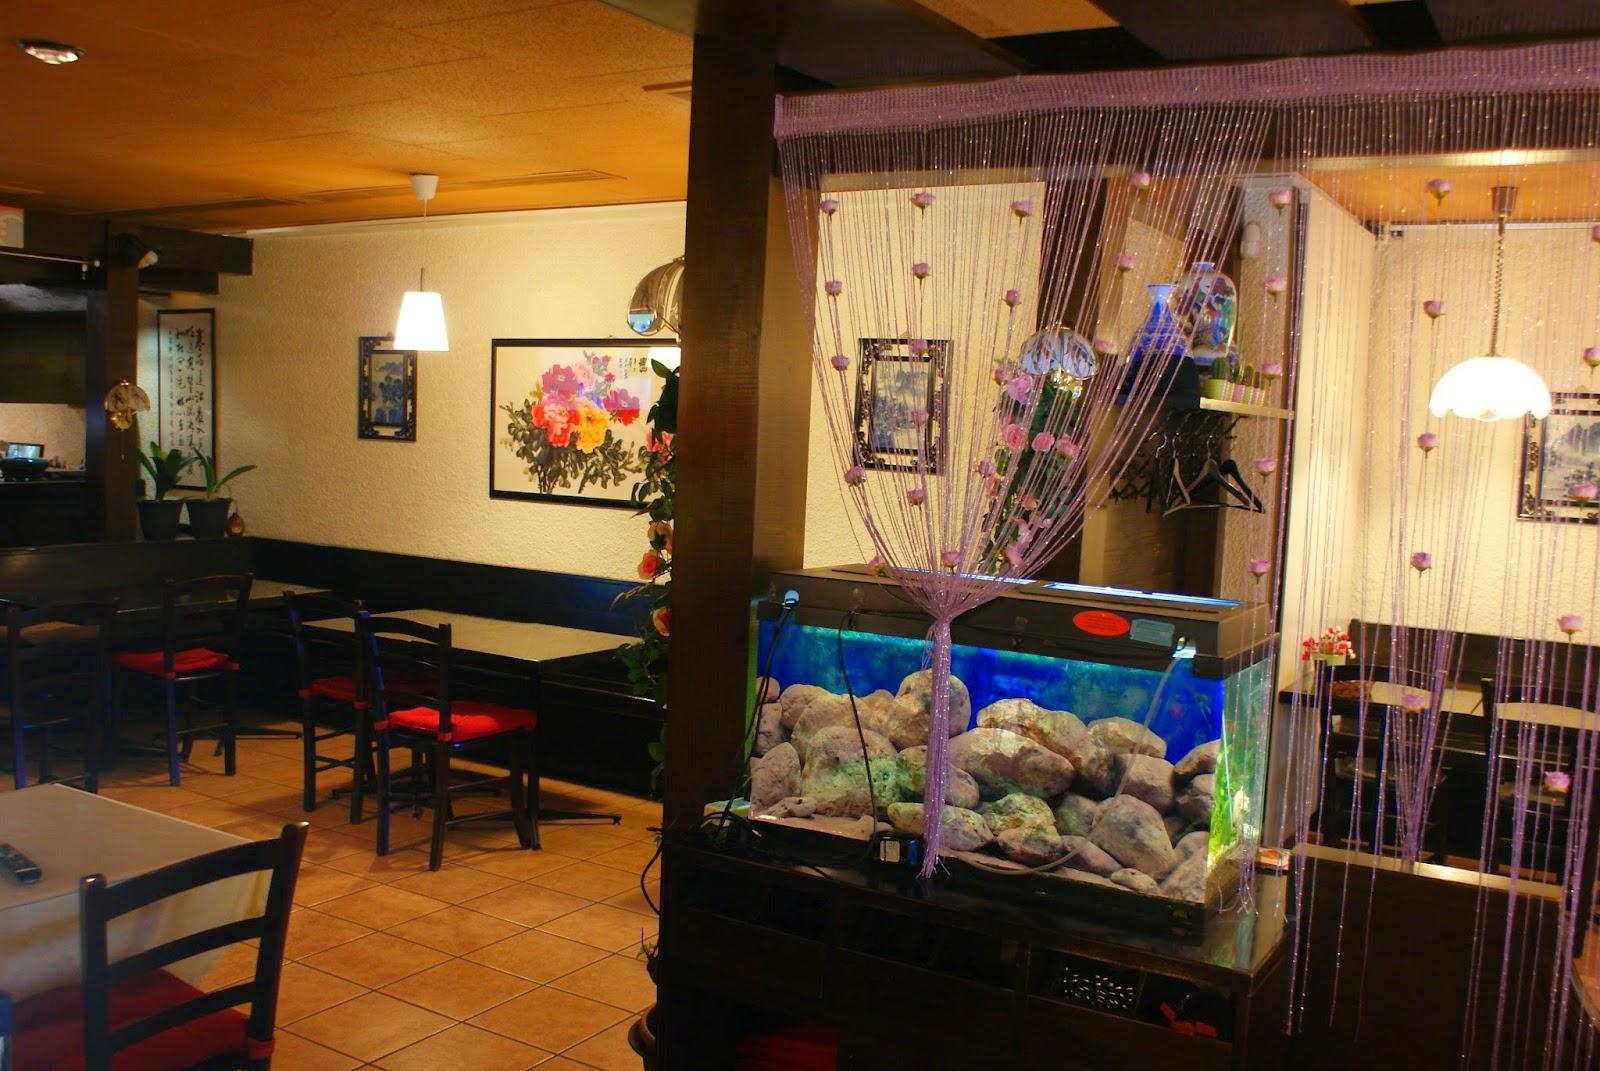 Restaurant Chinois Lausanne Ferm Ef Bf Bd